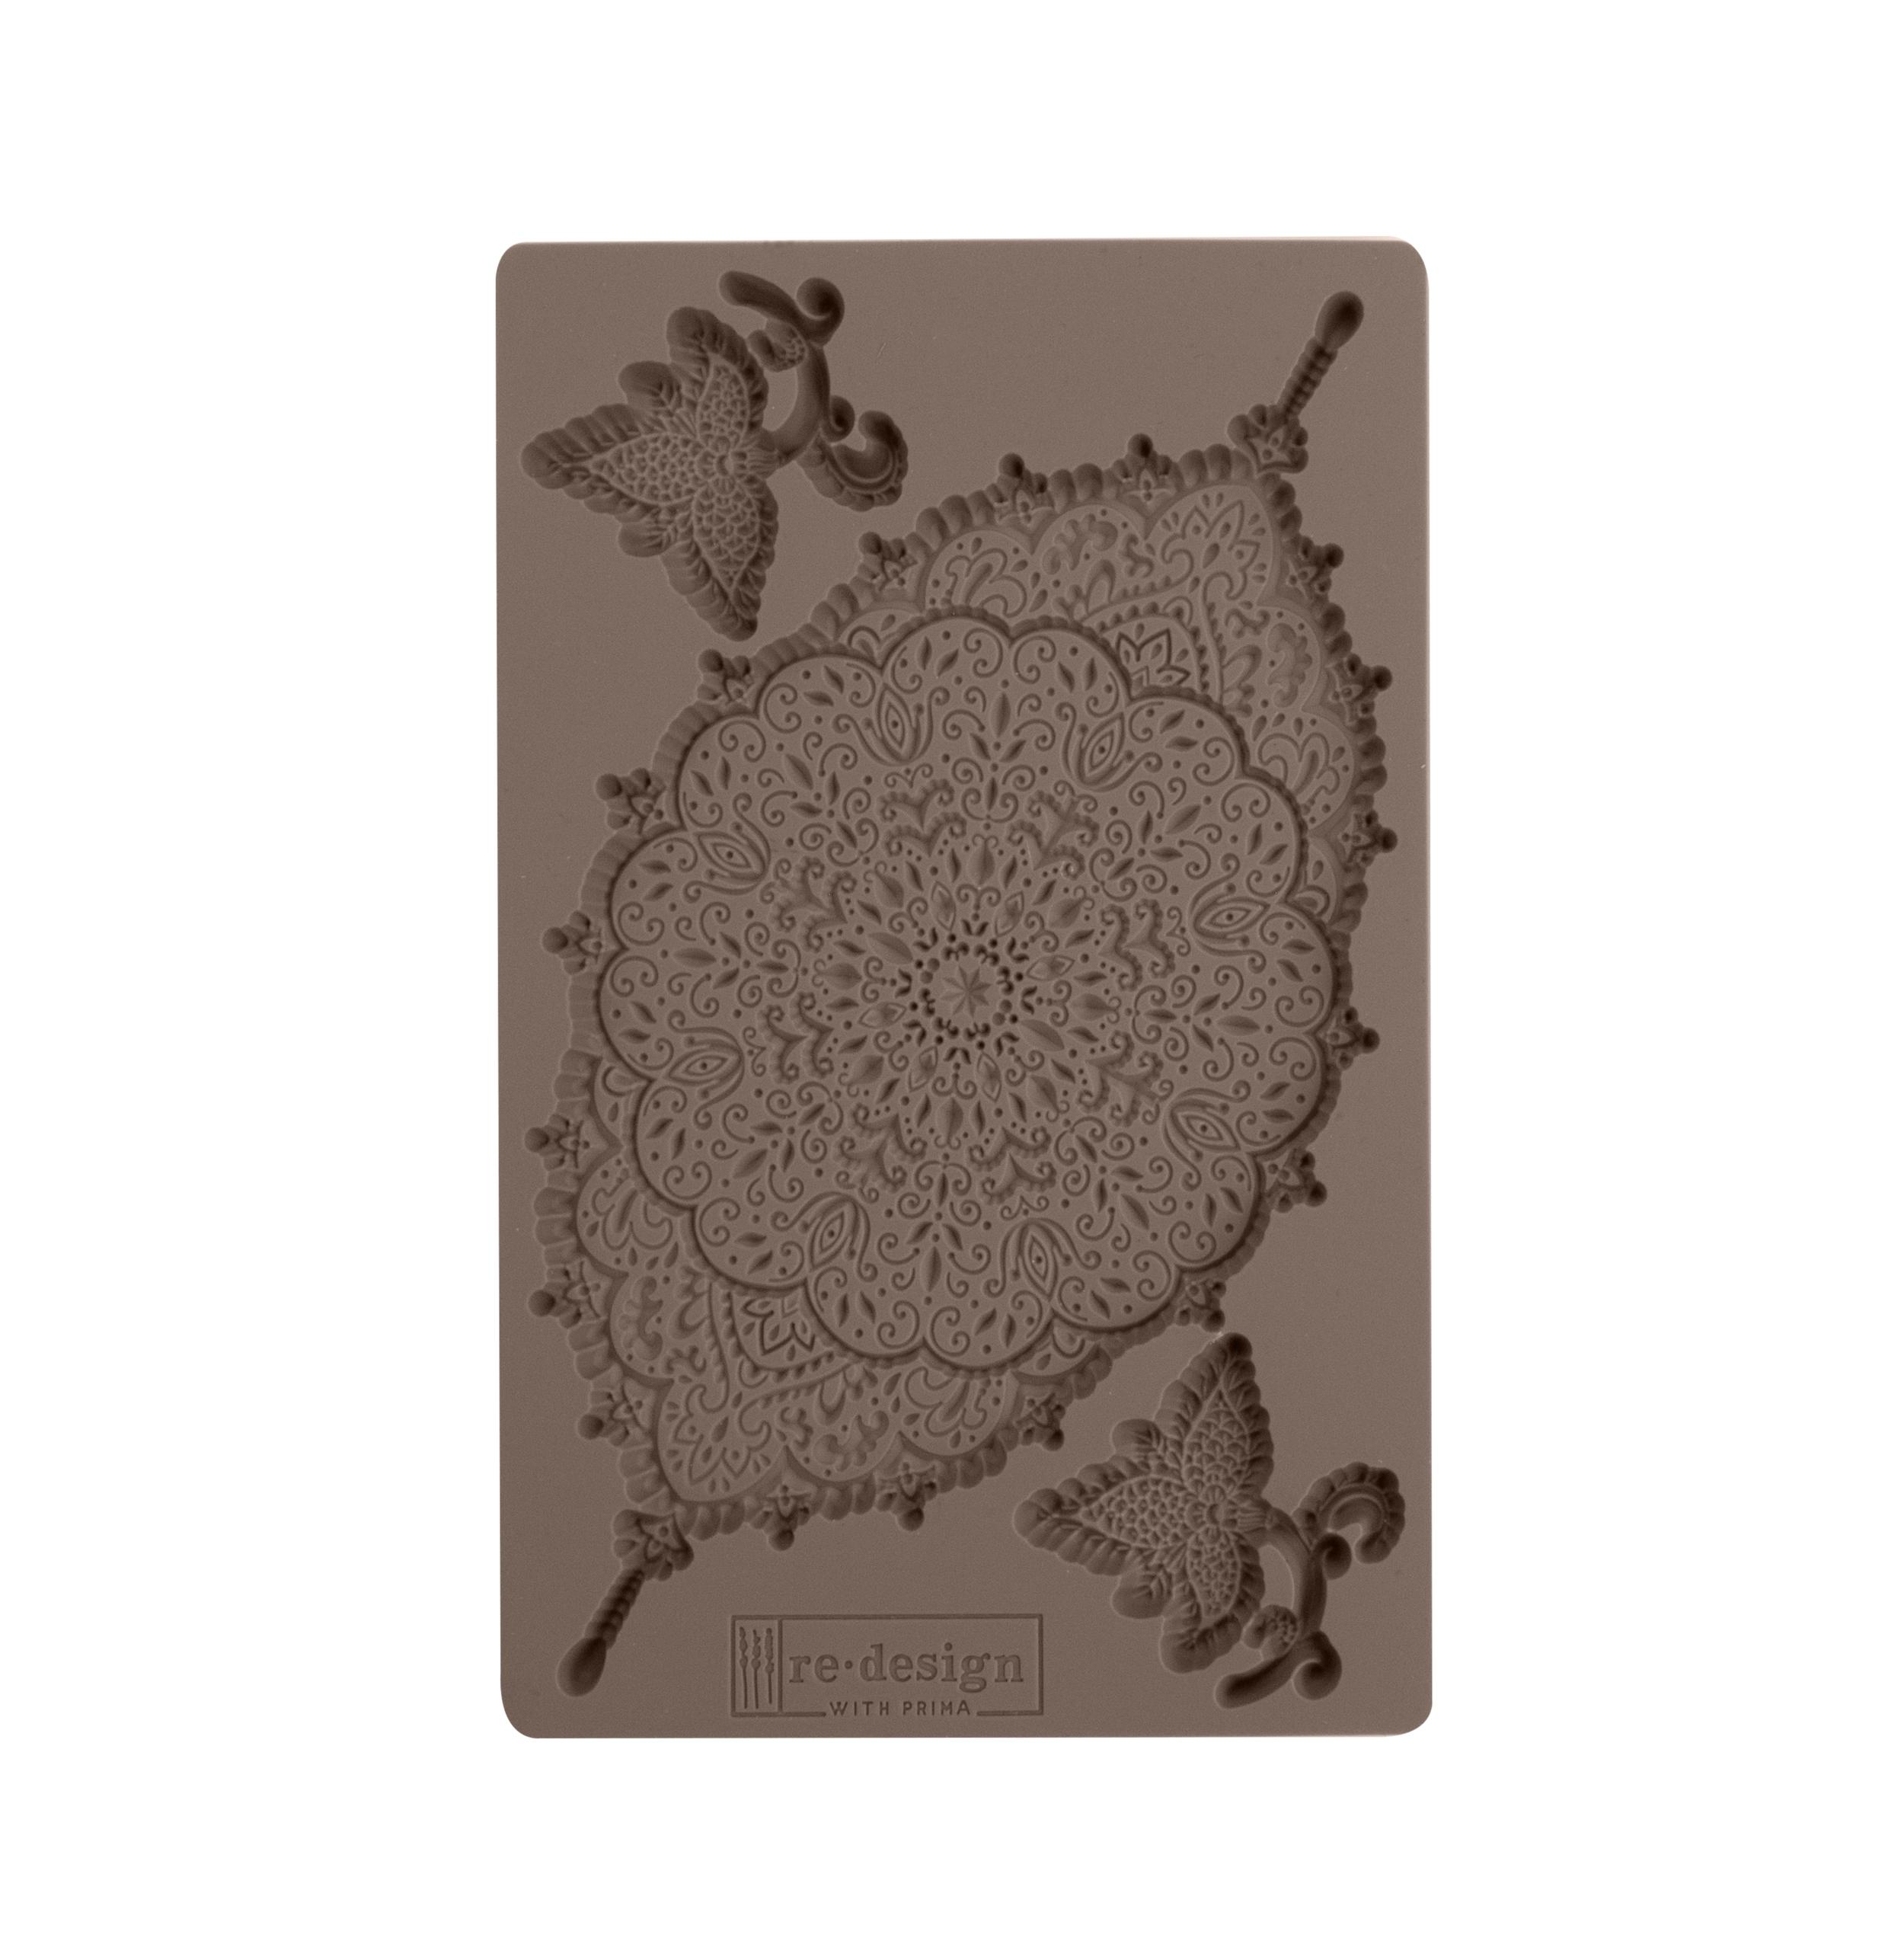 641047 Morocco Emblem